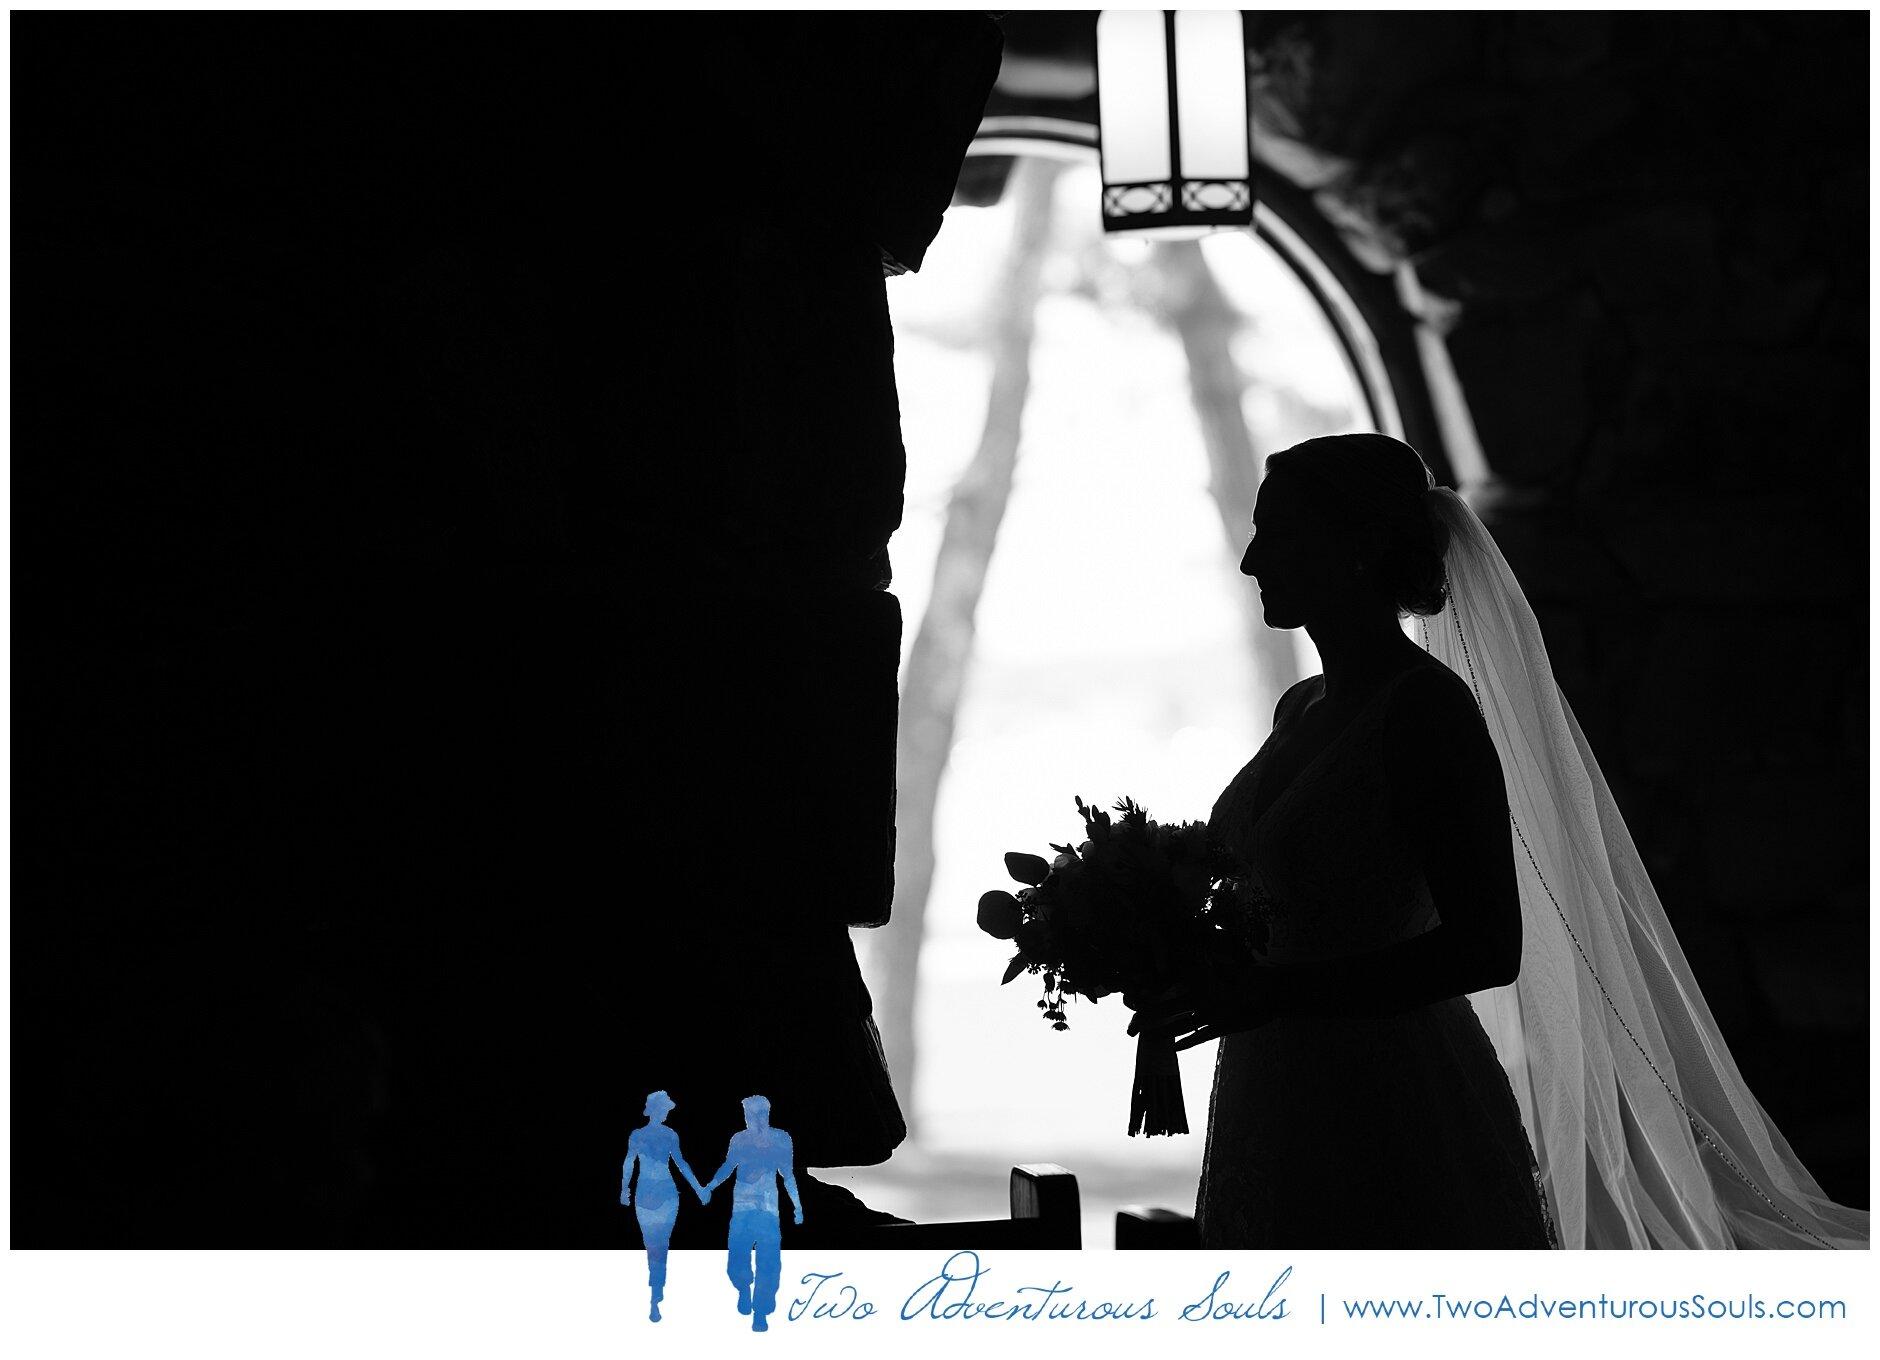 Breakwater Inn and Spa Wedding Photographers, Kennebunkport Wedding Photographers, Two Adventurous Souls- 092119_0025.jpg